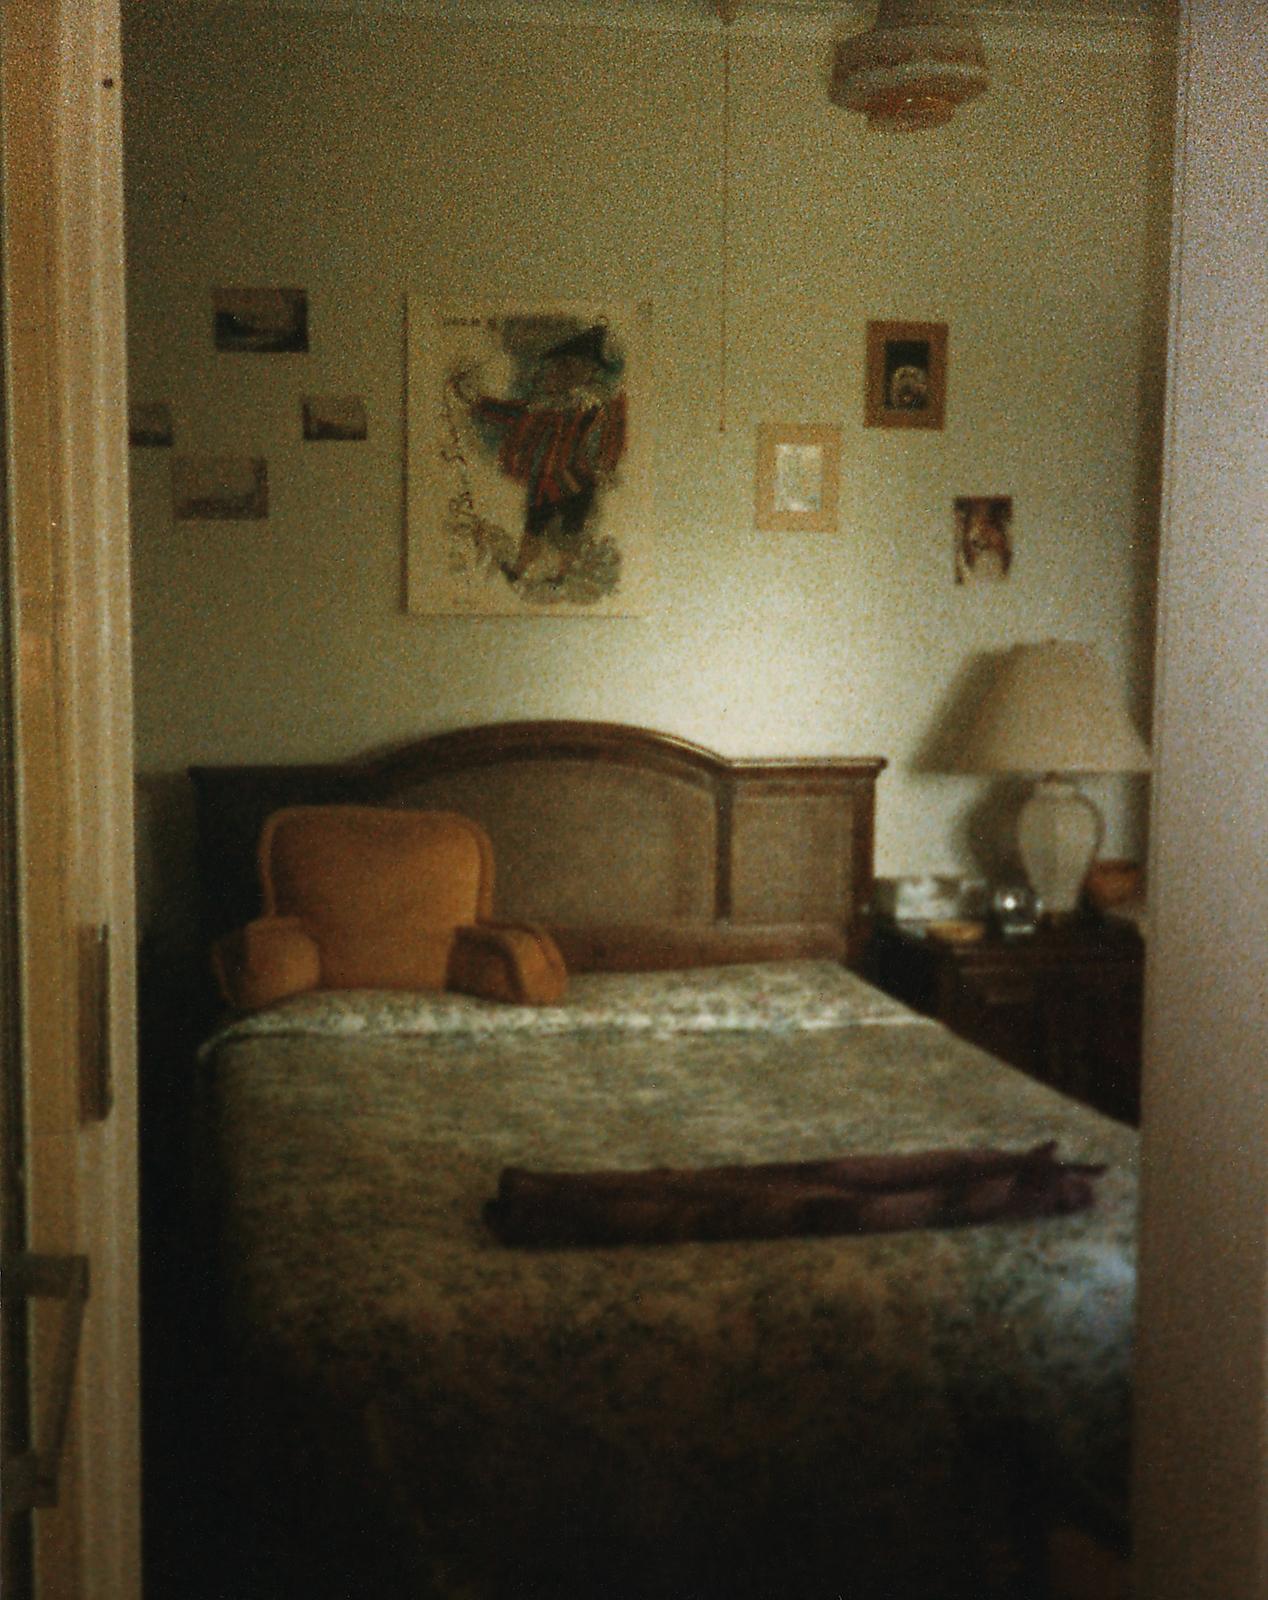 Mbabane - Standard Level Position Residence - 1987